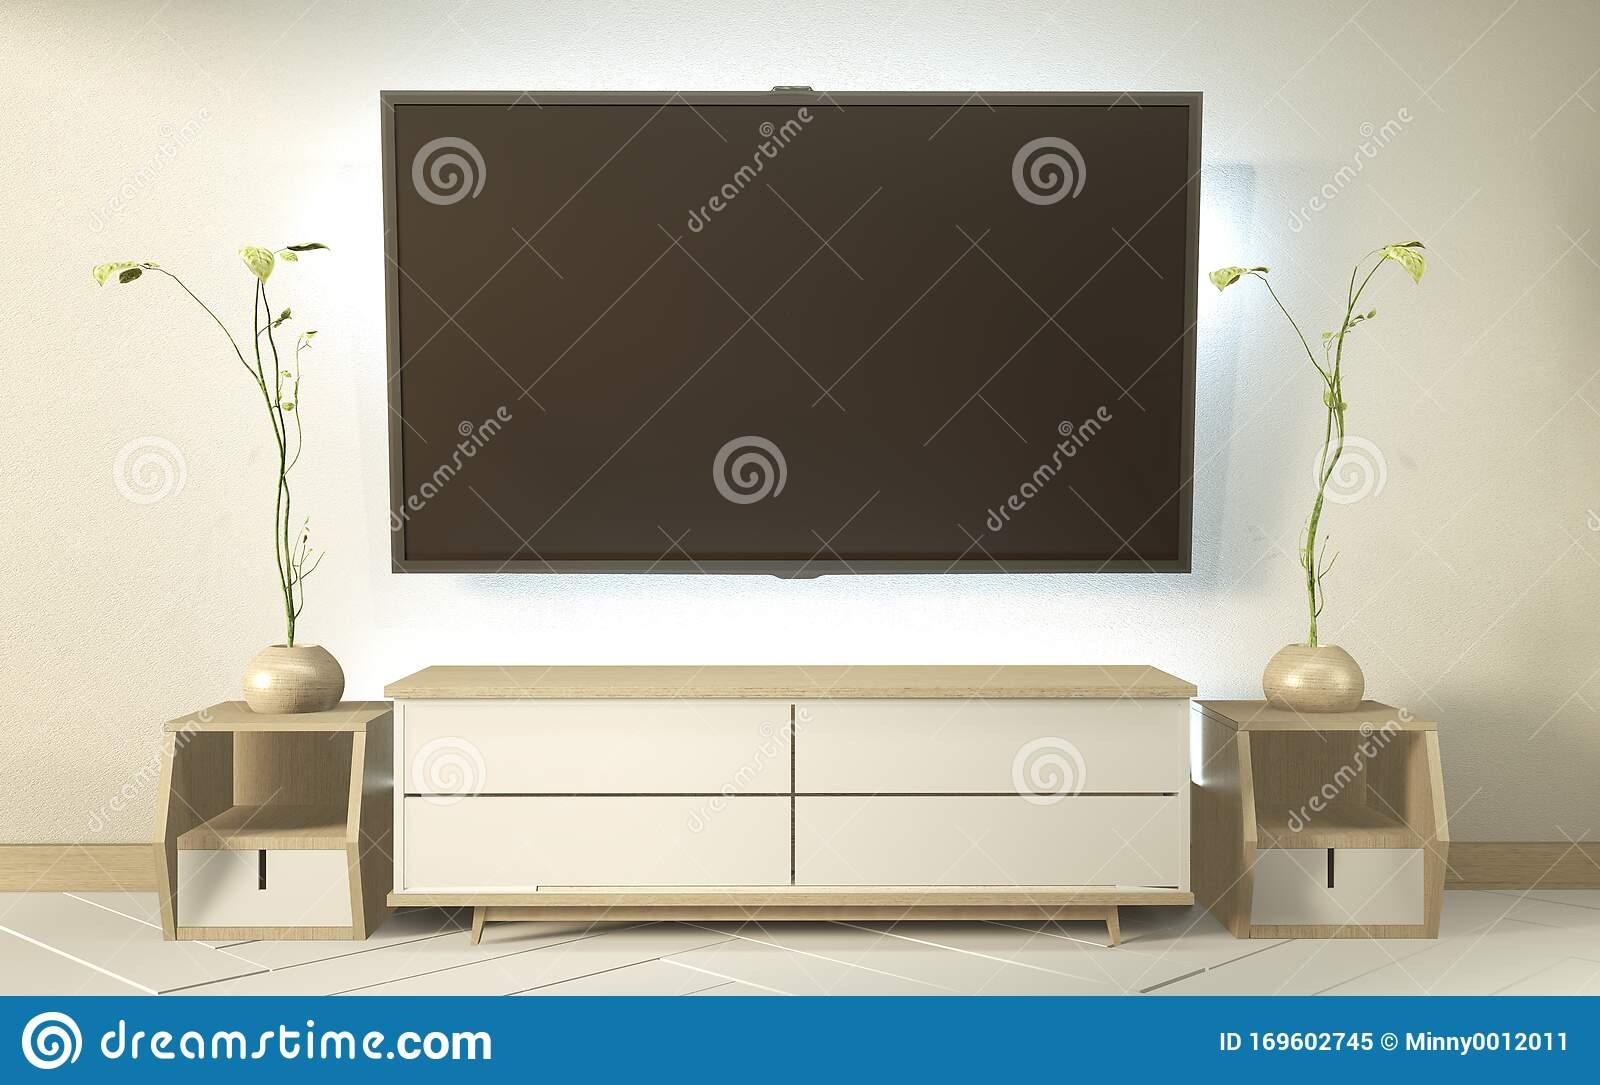 28+ Grey Kitchen Living Room Ideas Background